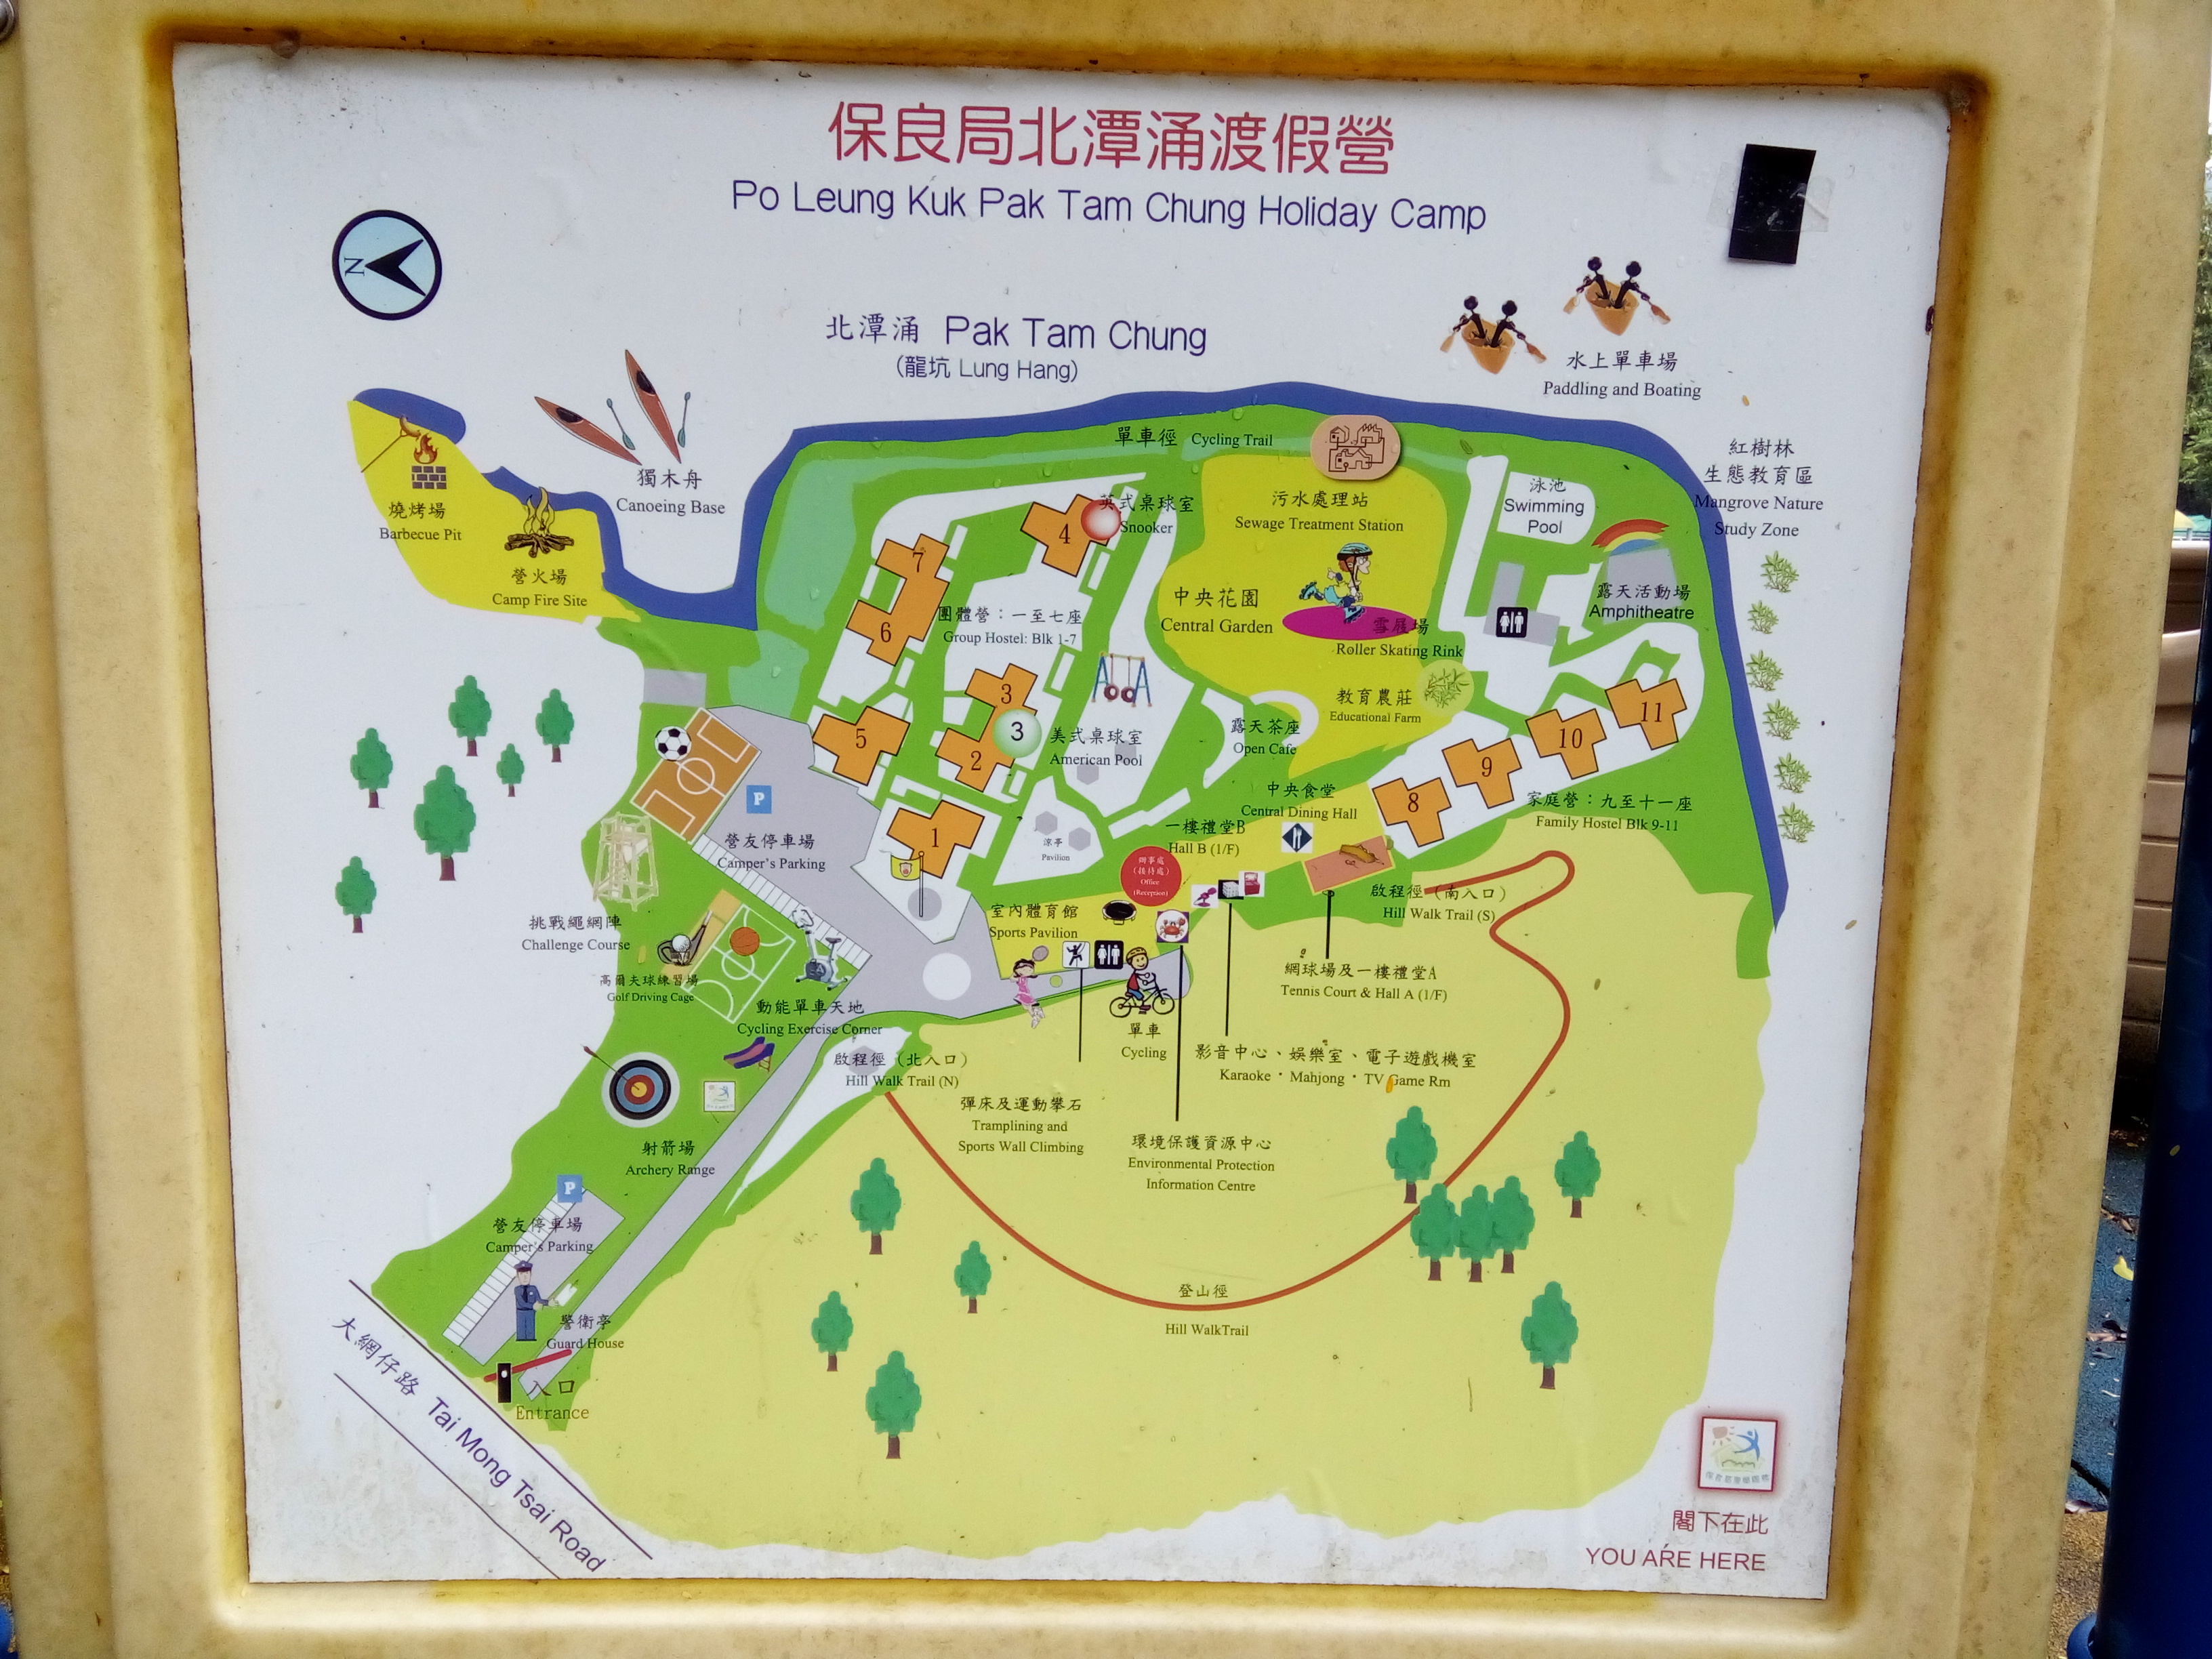 File:HK PLK Pak Tam Chung Holiday Camp 保良局北潭涌渡假營 Po Leung Kuk map sign October 2016 Lnv.jpg - Wikimedia Commons